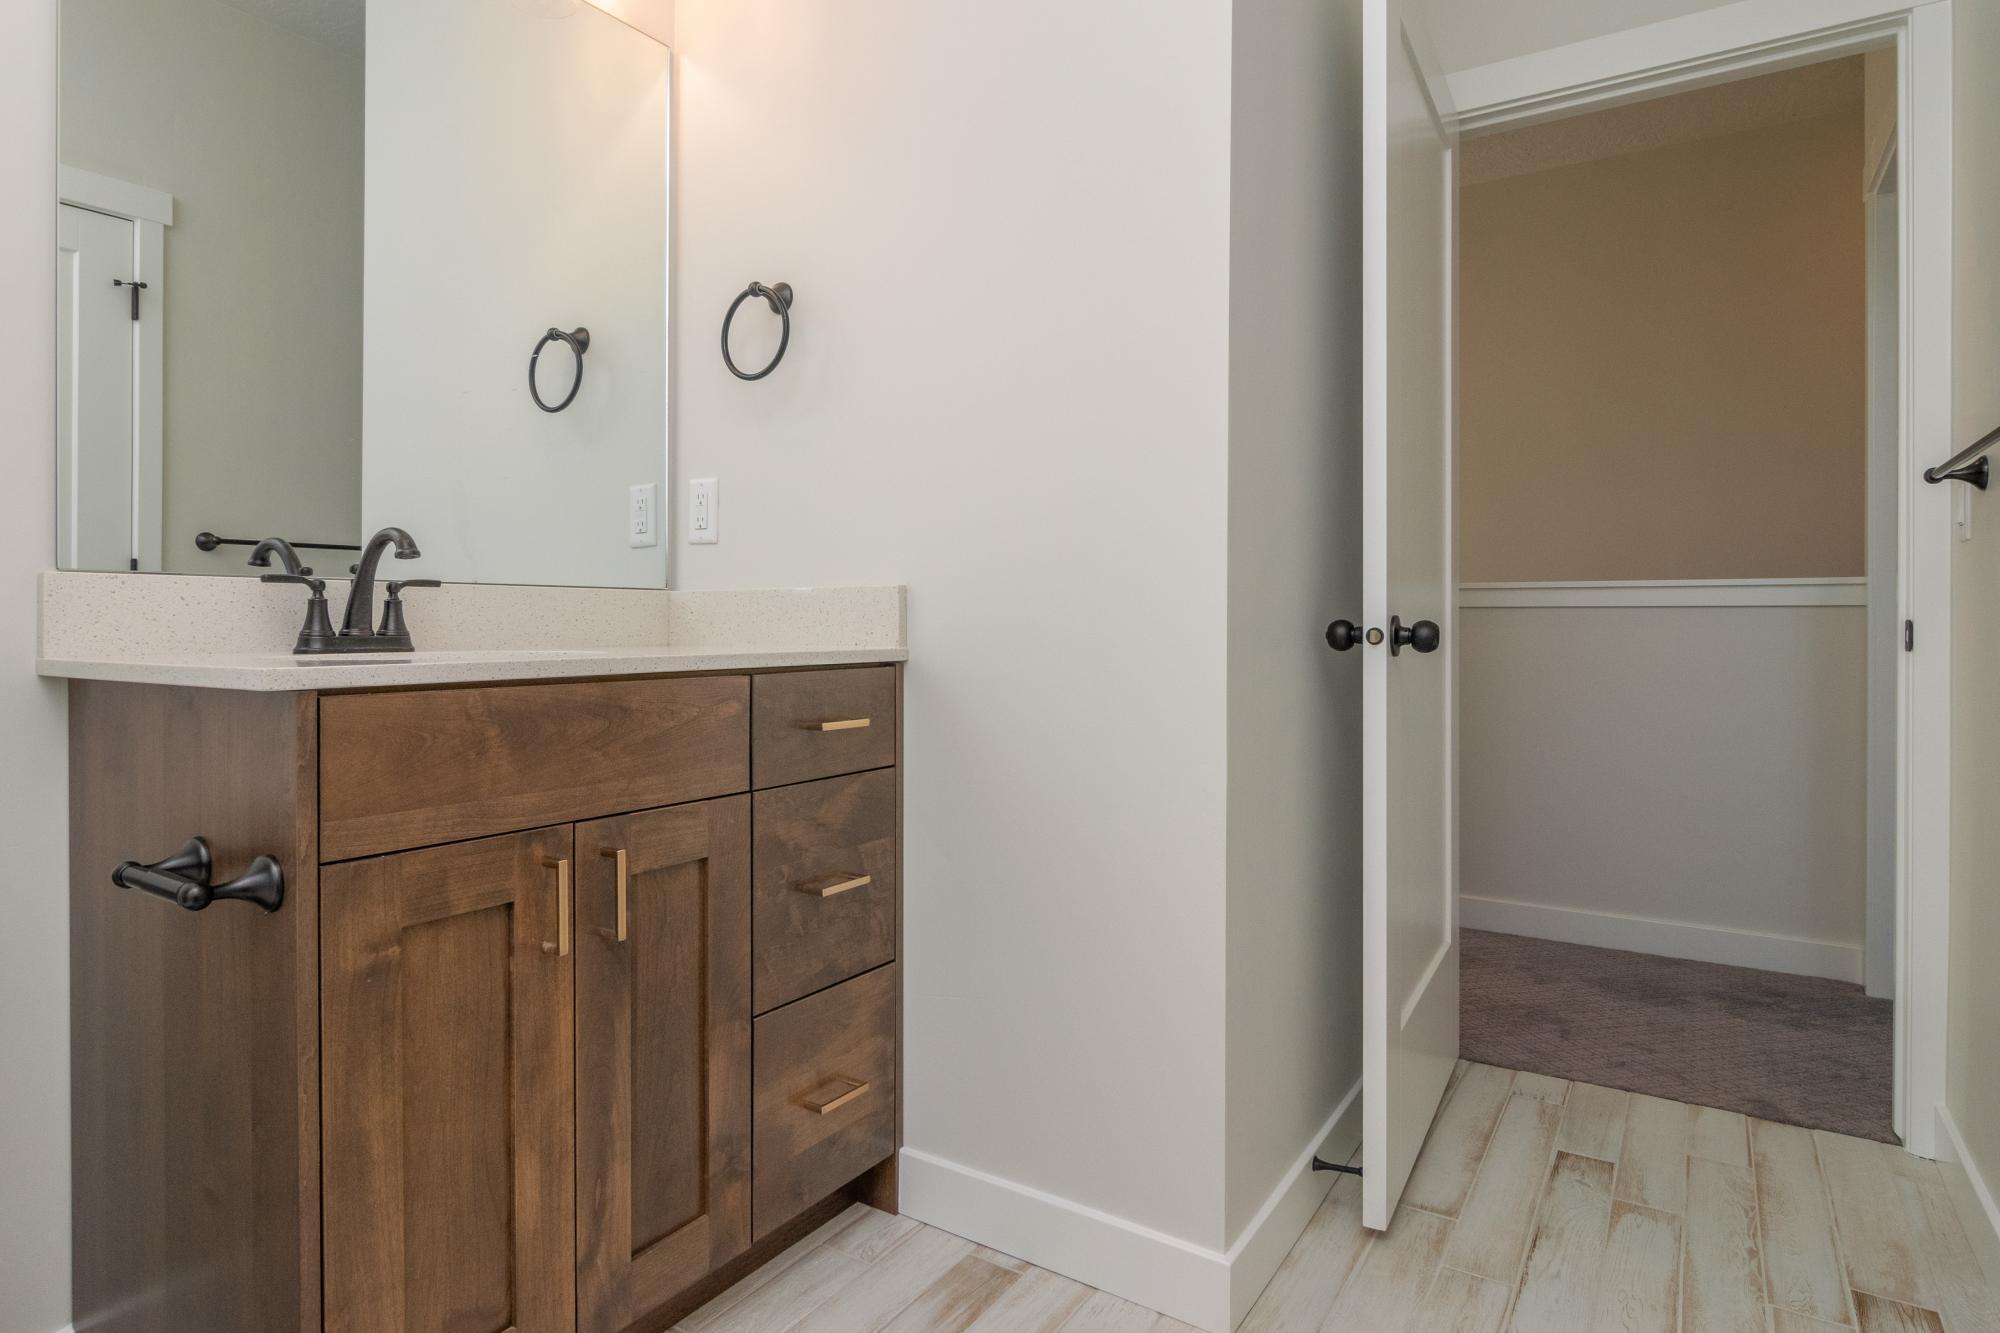 Bathroom featured in the 10738 S Porcini Dr By Destination Homes in Salt Lake City-Ogden, UT